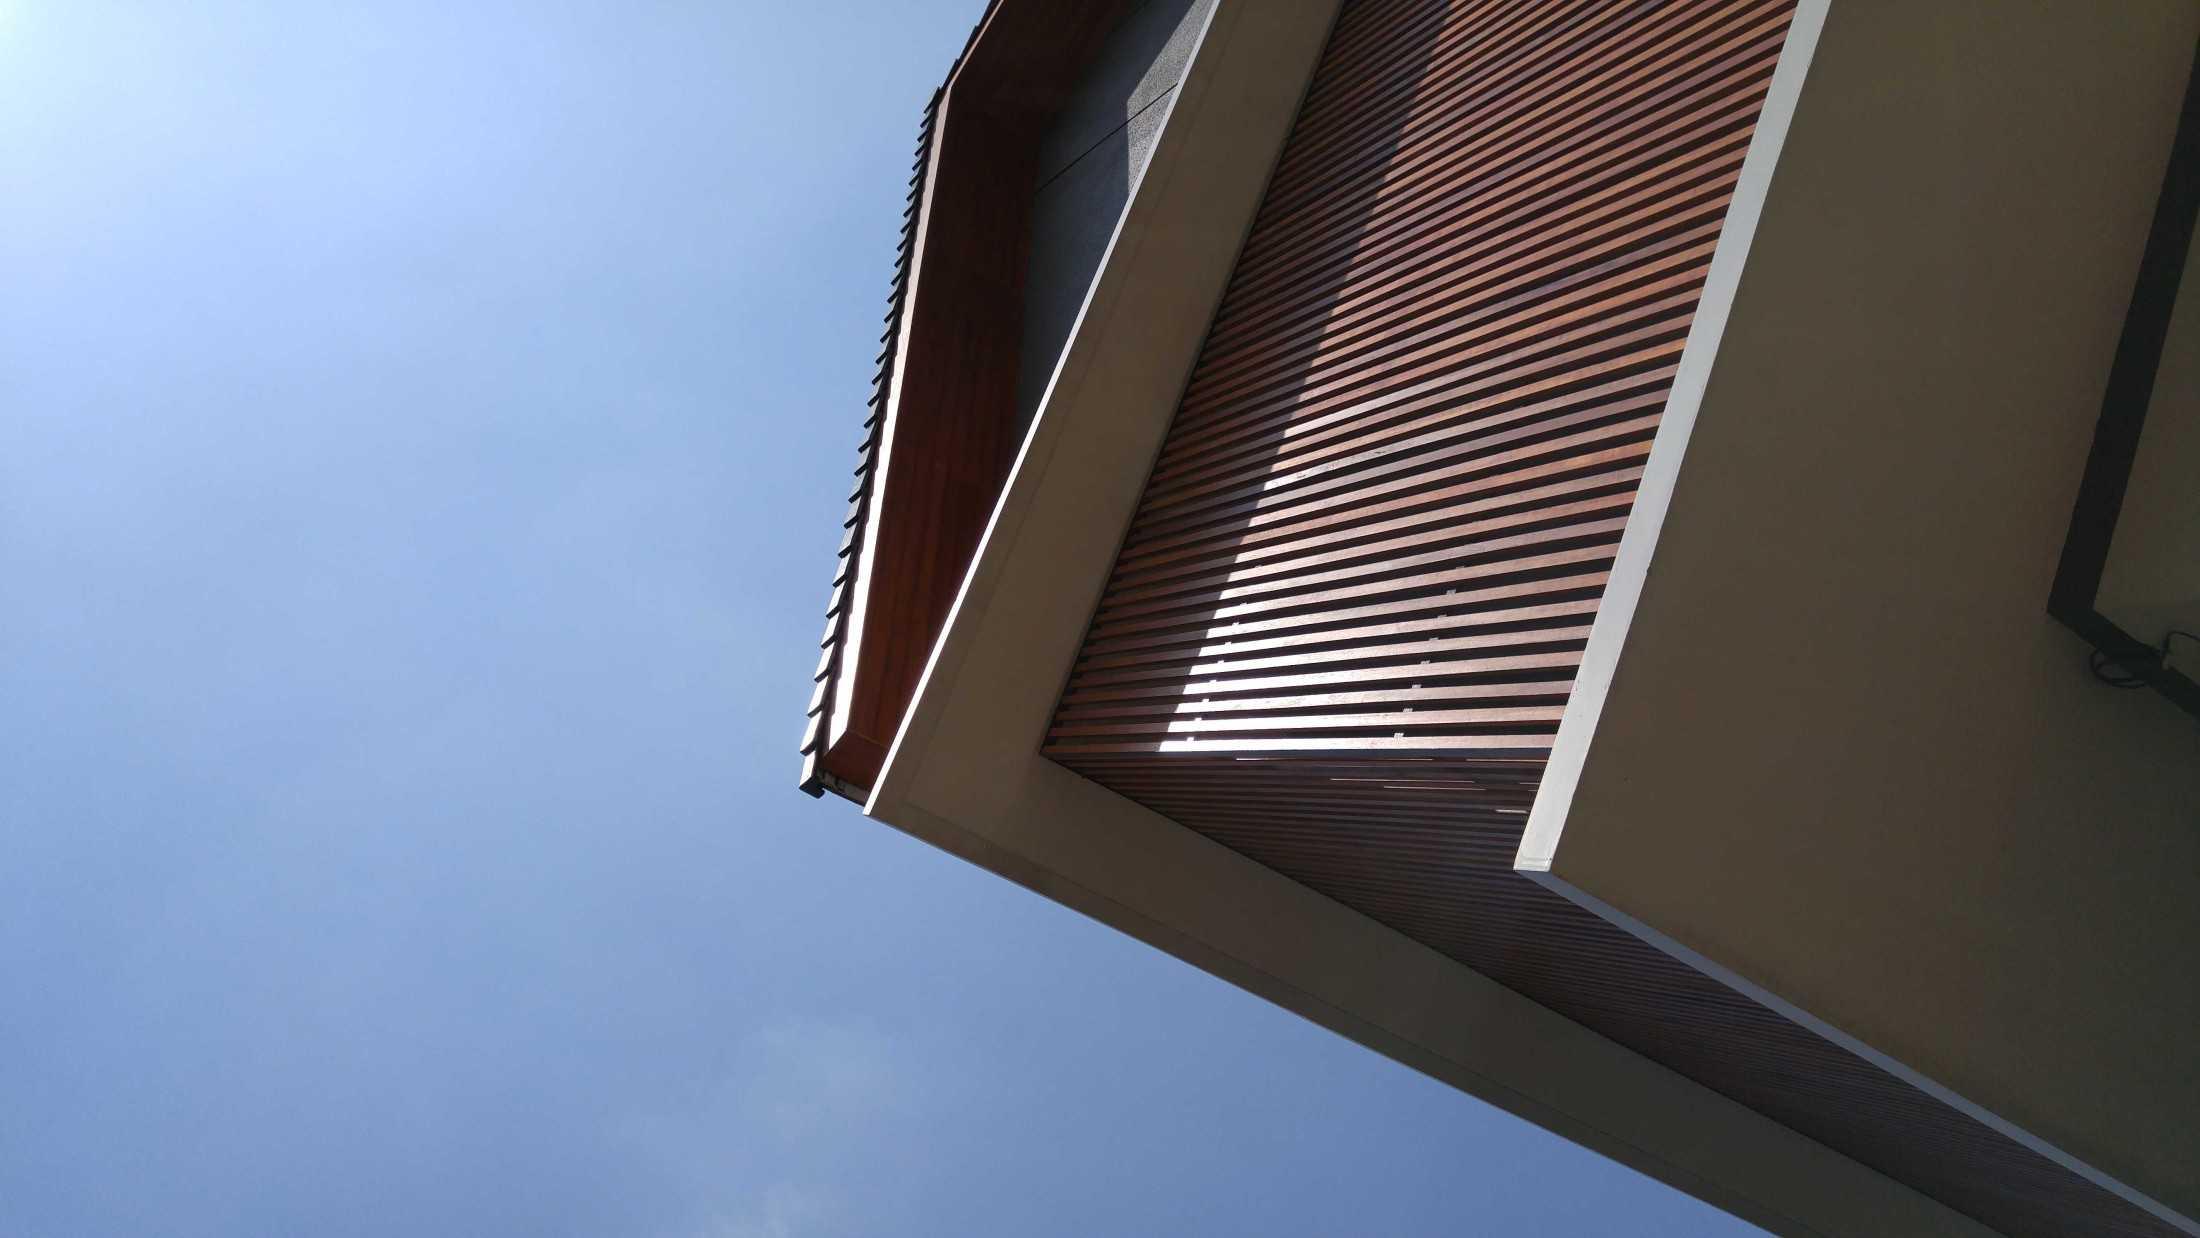 Gohte Architects Vk Homes Lippo Karawaci, Binong, Kec. Curug, Tangerang, Banten, Indonesia Lippo Karawaci, Binong, Kec. Curug, Tangerang, Banten, Indonesia Gohte-Architects-Vk-Homes  96615